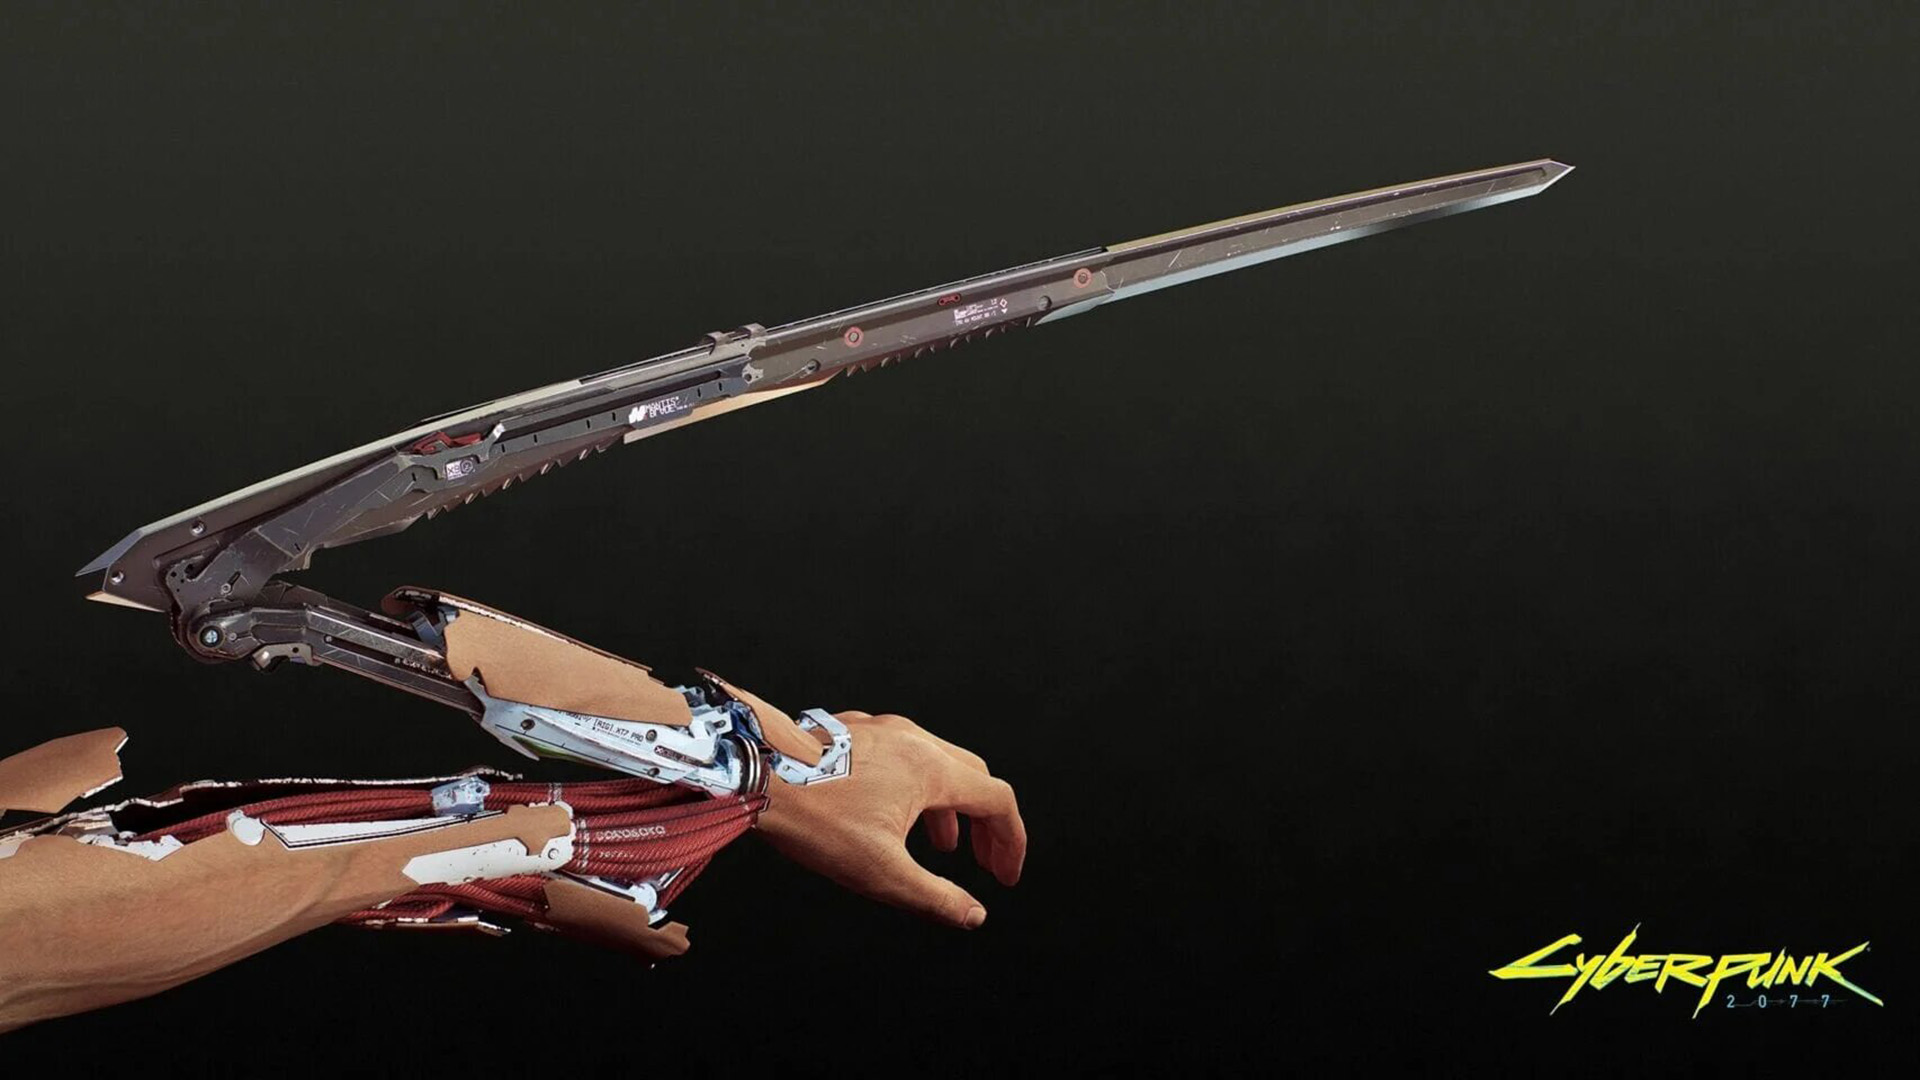 Cyberpunk 2077 - Mantis Blades